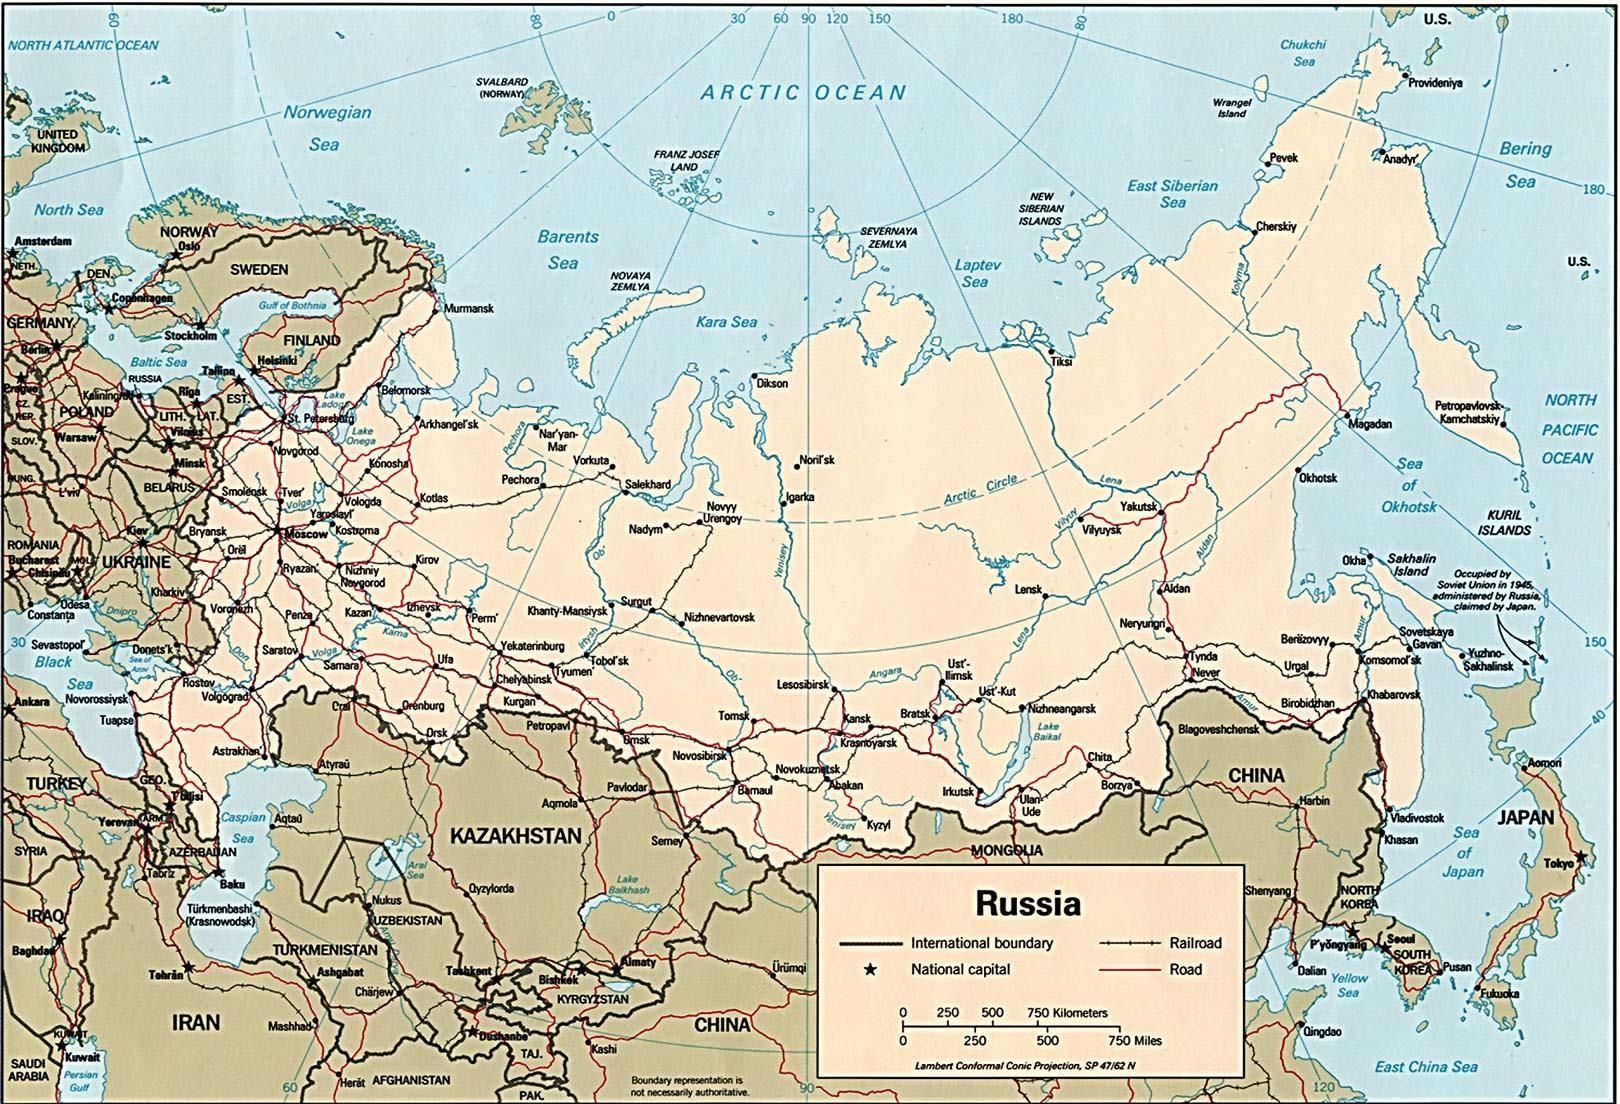 russia_map_capital_railroad_road_scale_miles_km